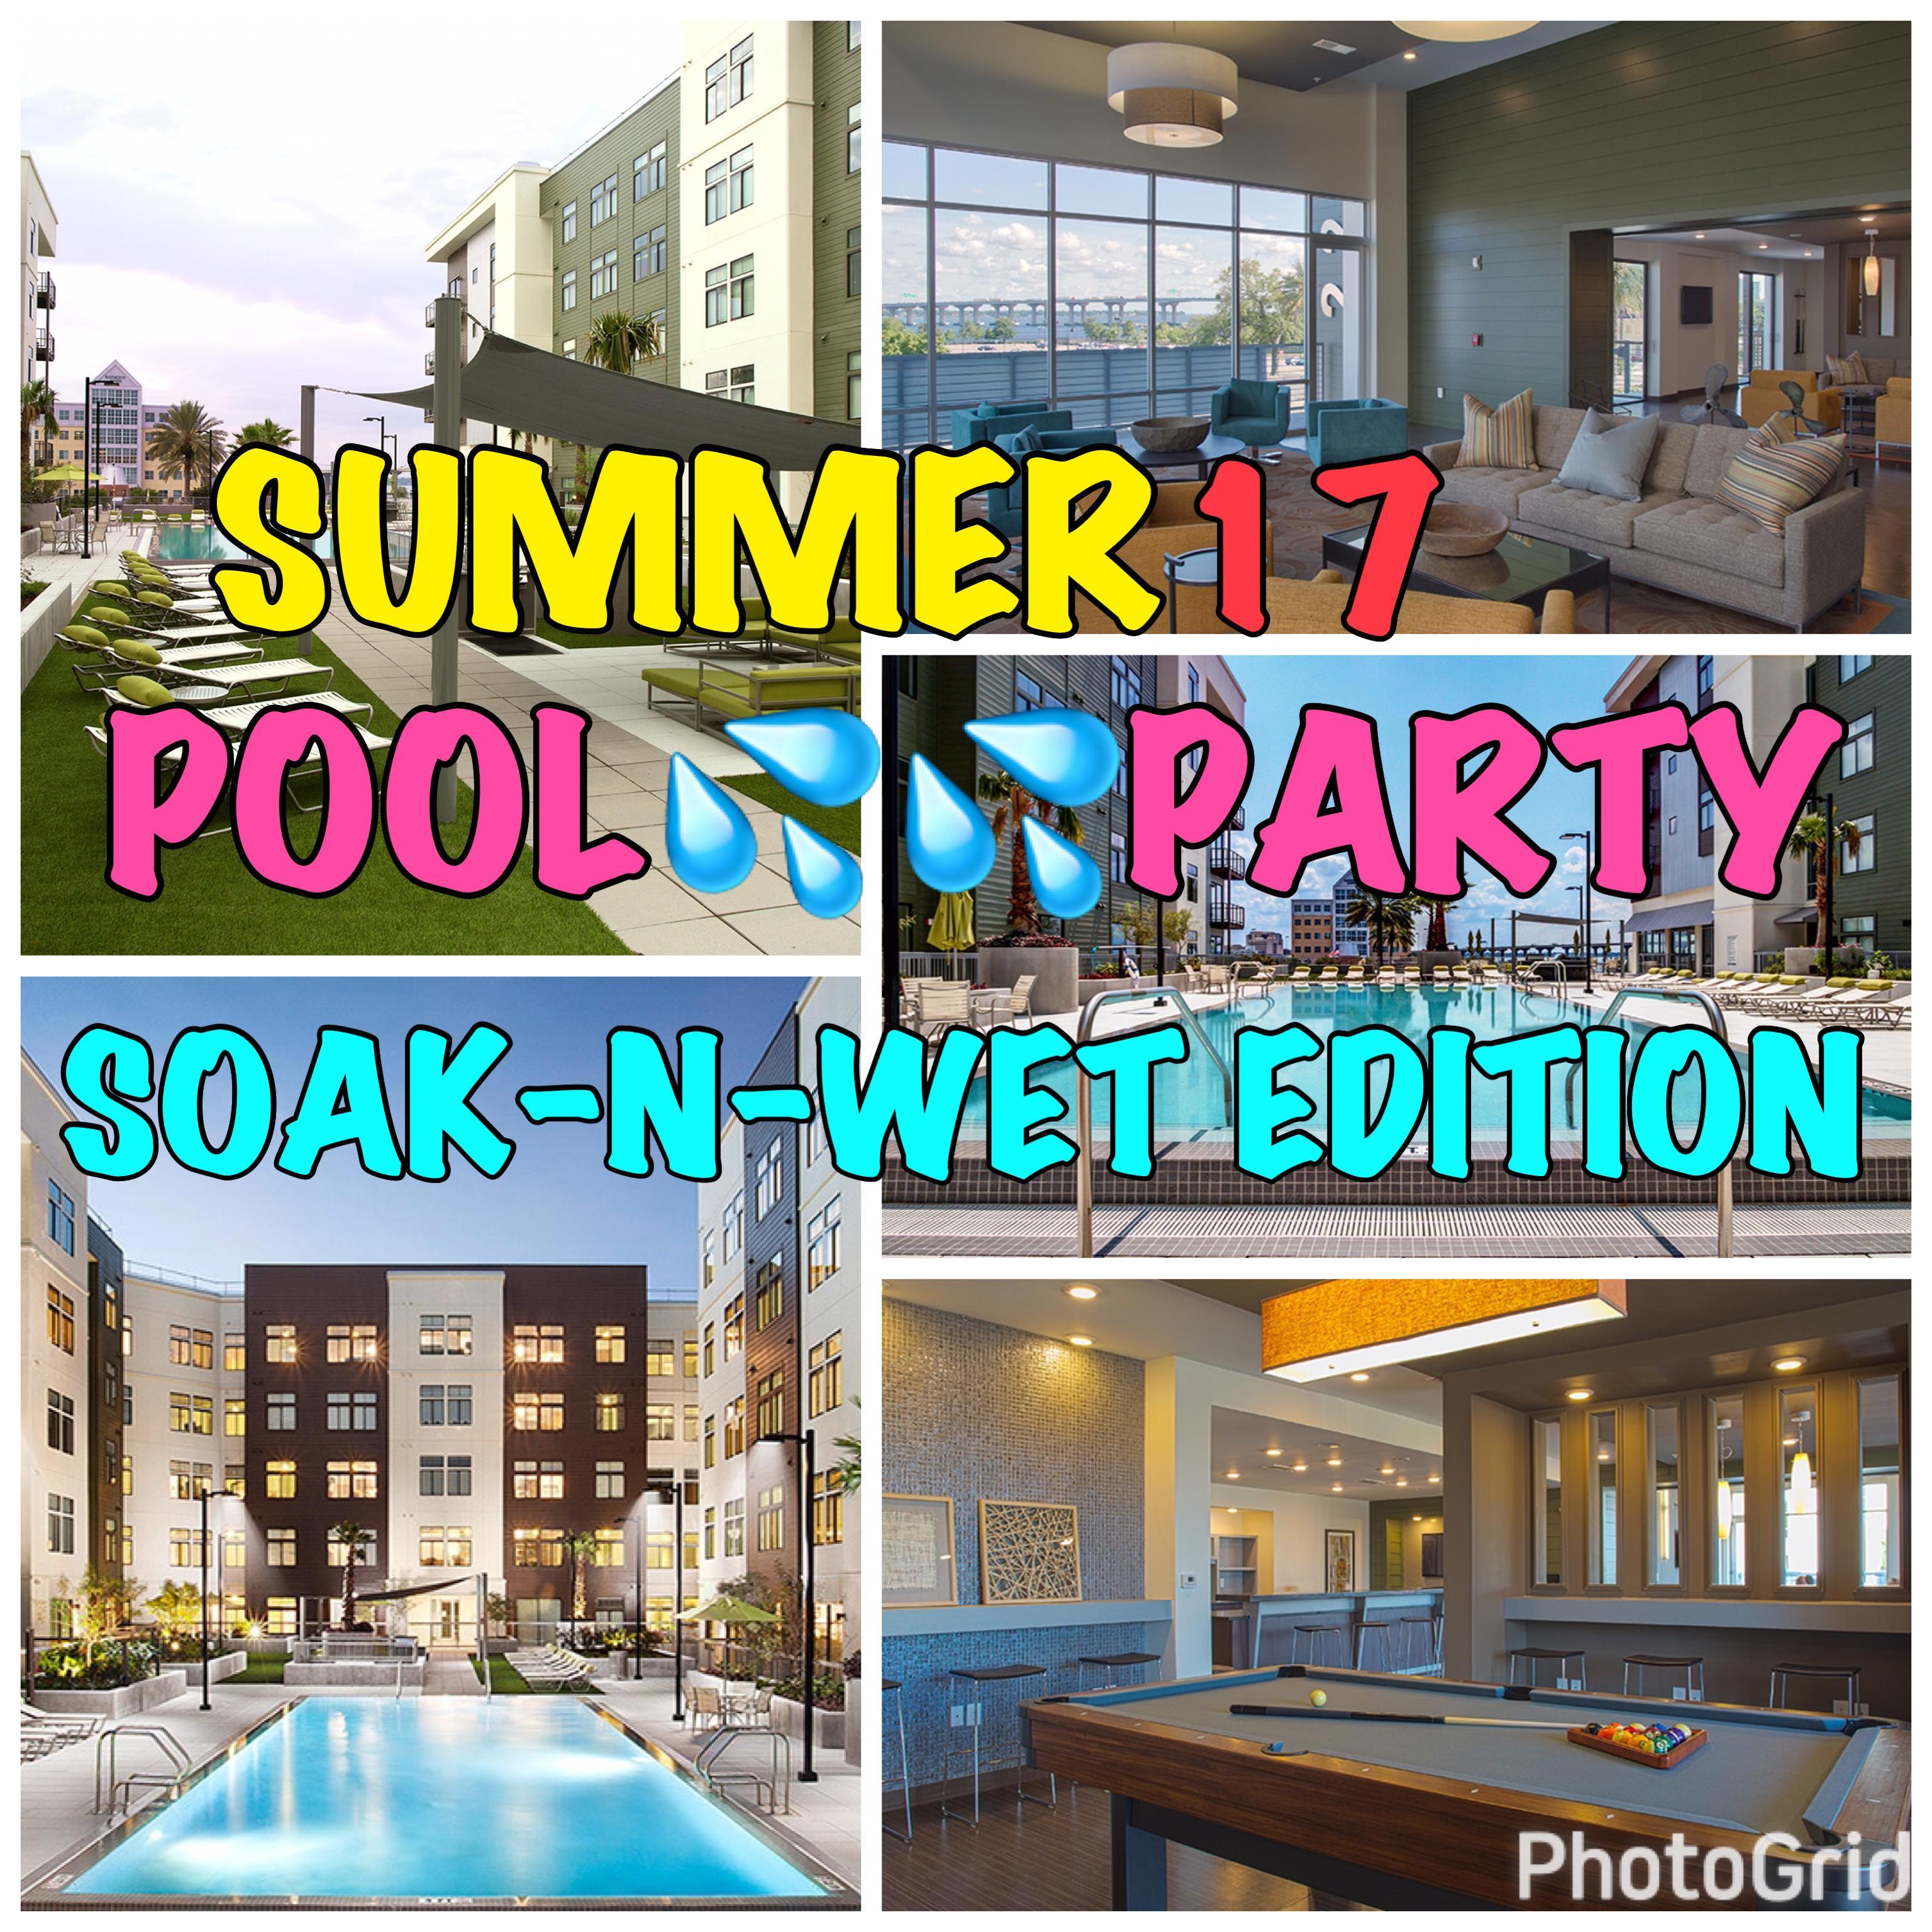 "SUMMER 17' POOL PARTY ""Soak-n-Wet Edition"""